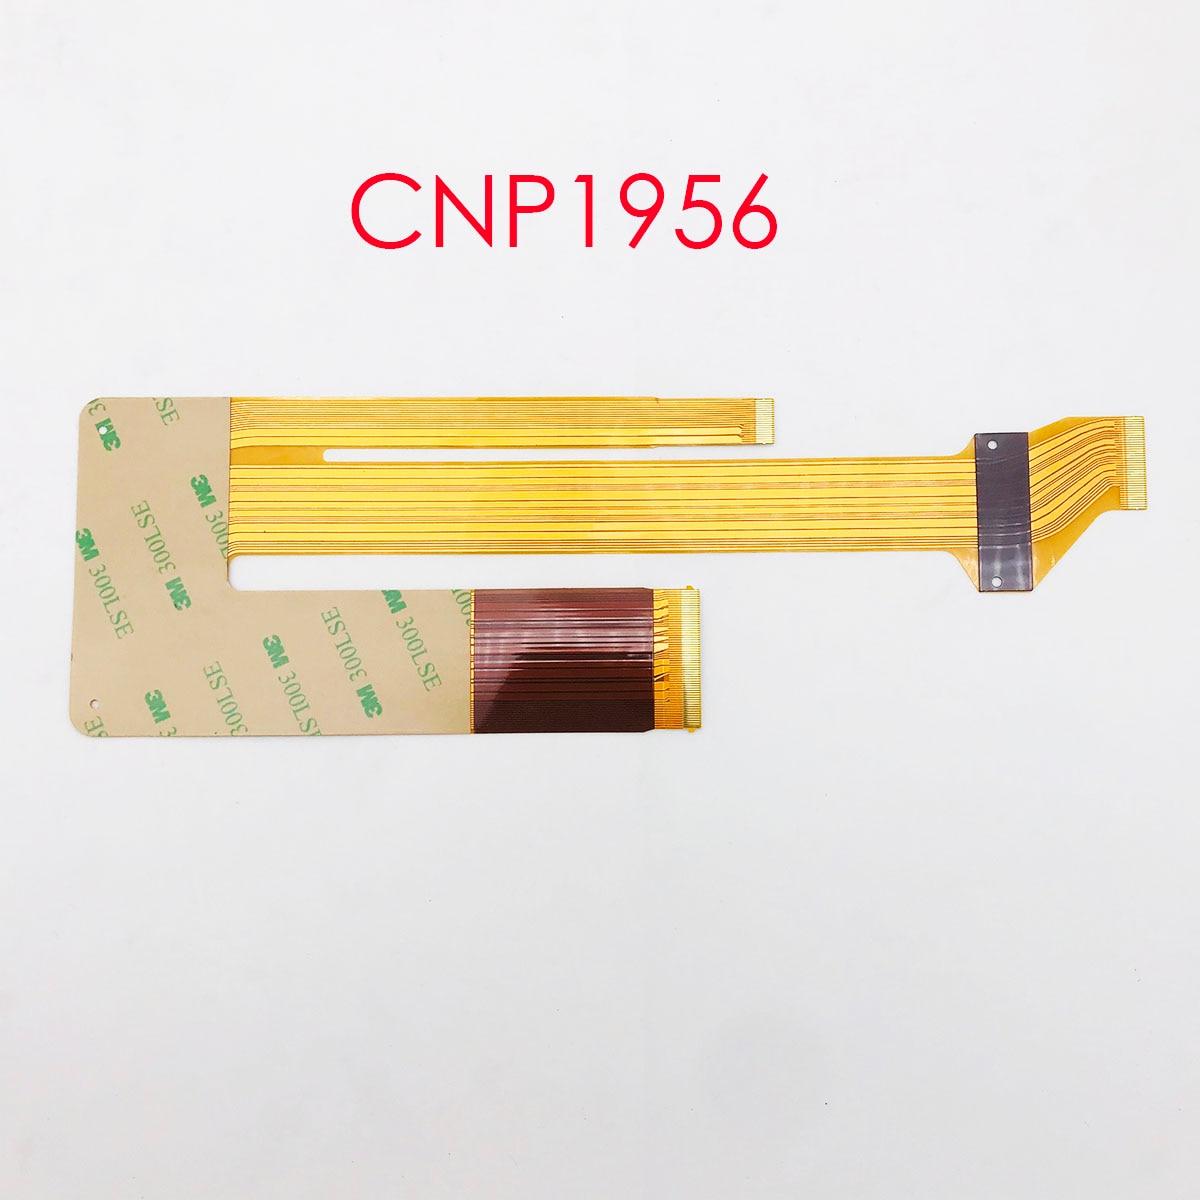 Neue Flexible FPC Flach Kabel 20 Pin 26 Pin 50 Pin Für DVD AVH-P 5000 5050 5080 5100 5150 5180 CNQ 1956 ORIGINAL KABEL